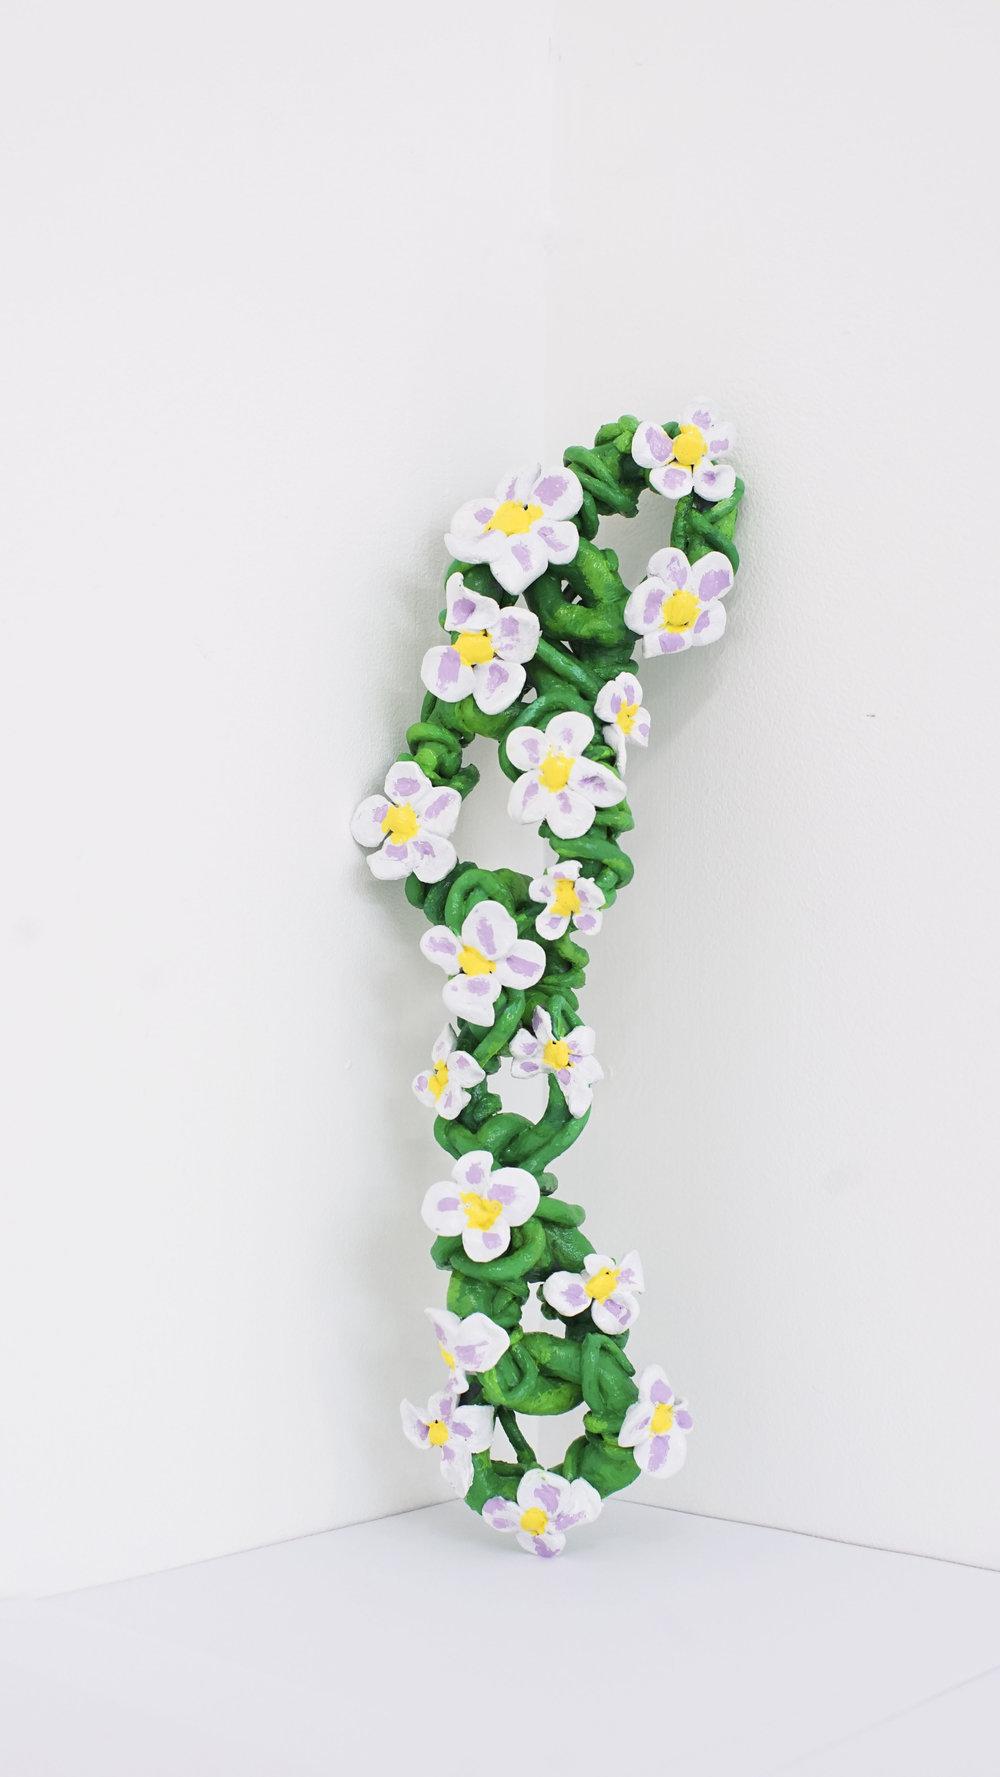 Daisy Chain 1.JPG